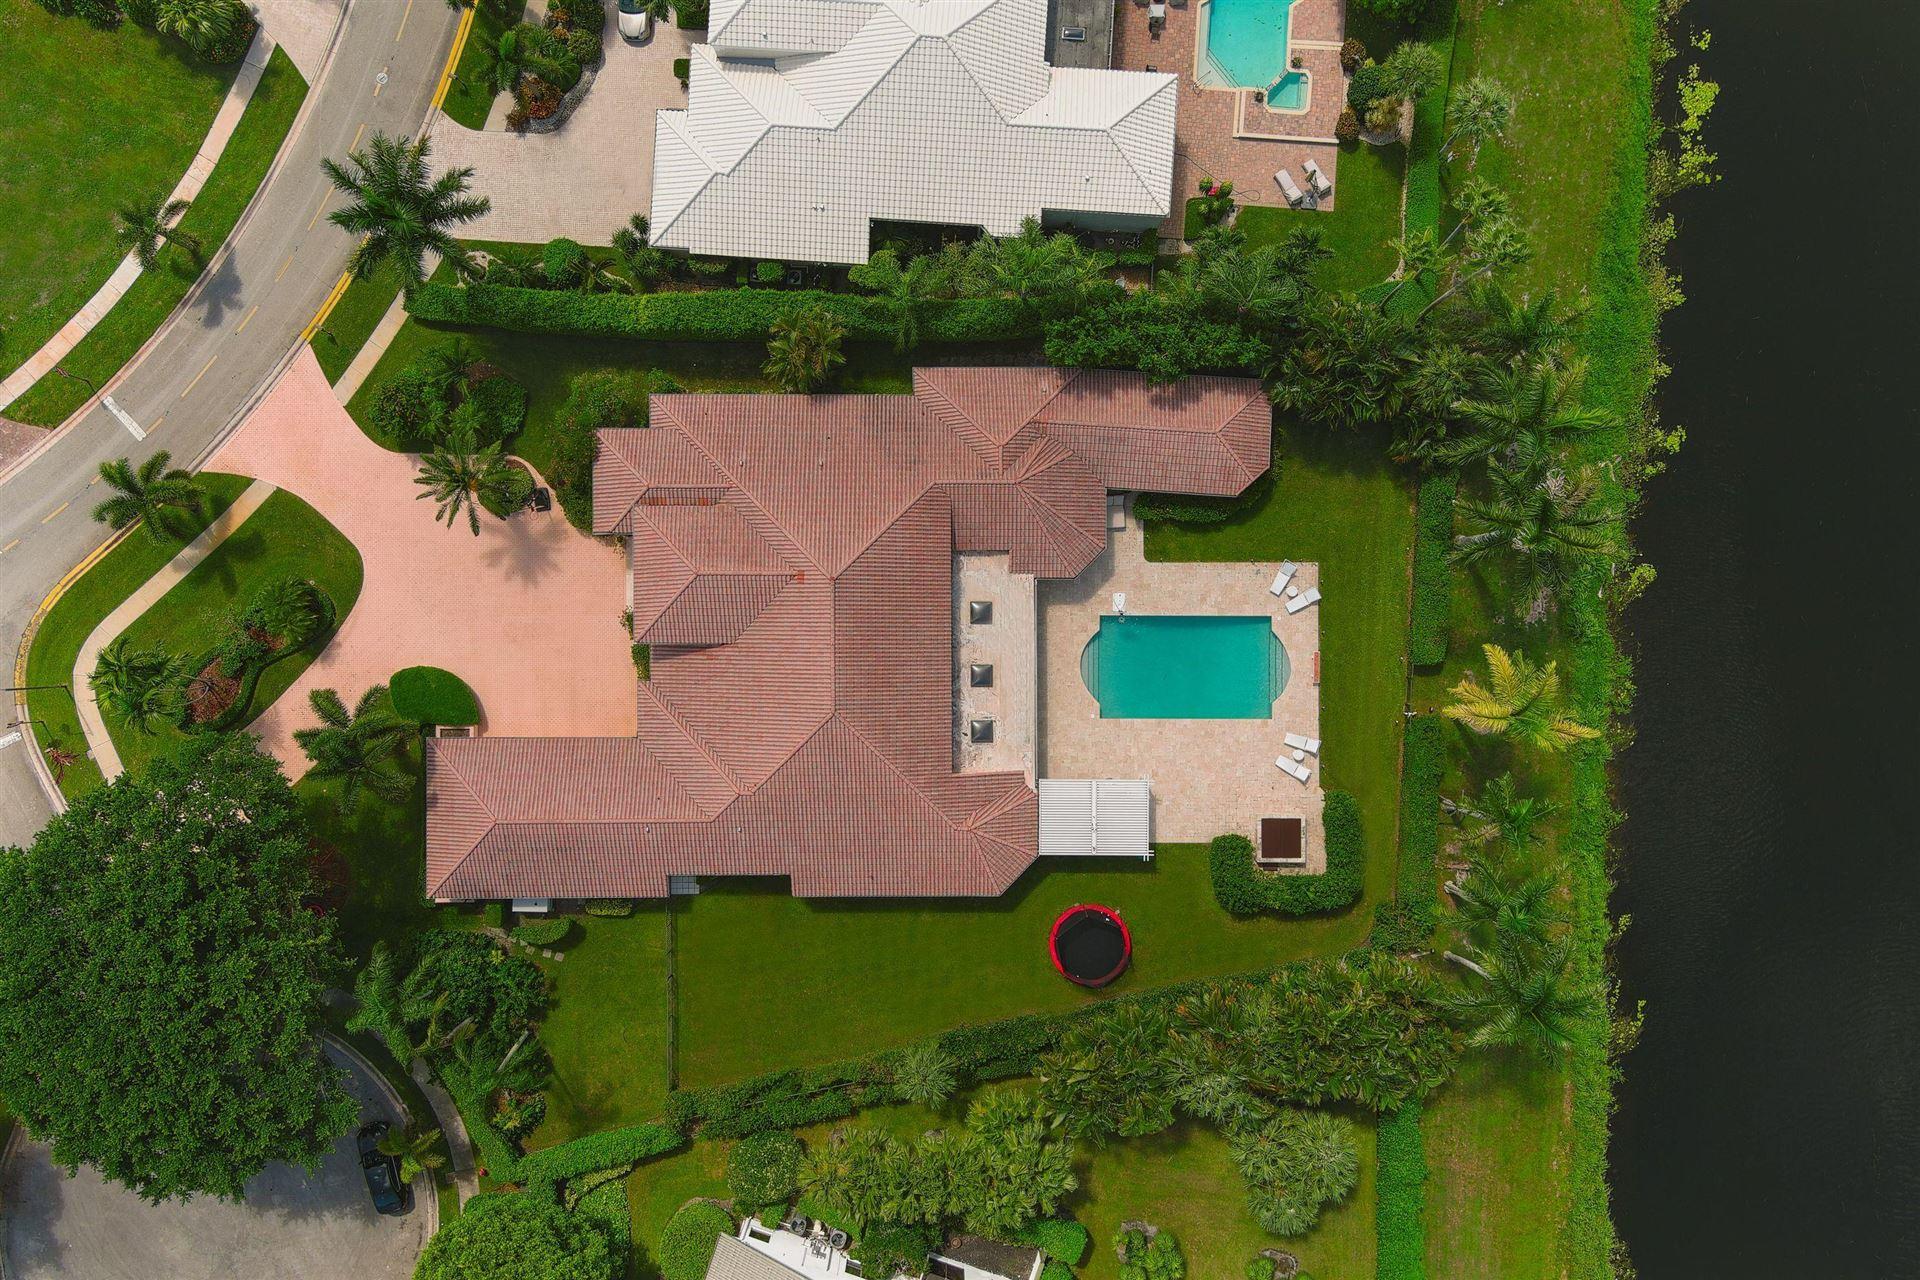 4348 Kasso Circle, Boca Raton, FL 33487 - #: RX-10652269